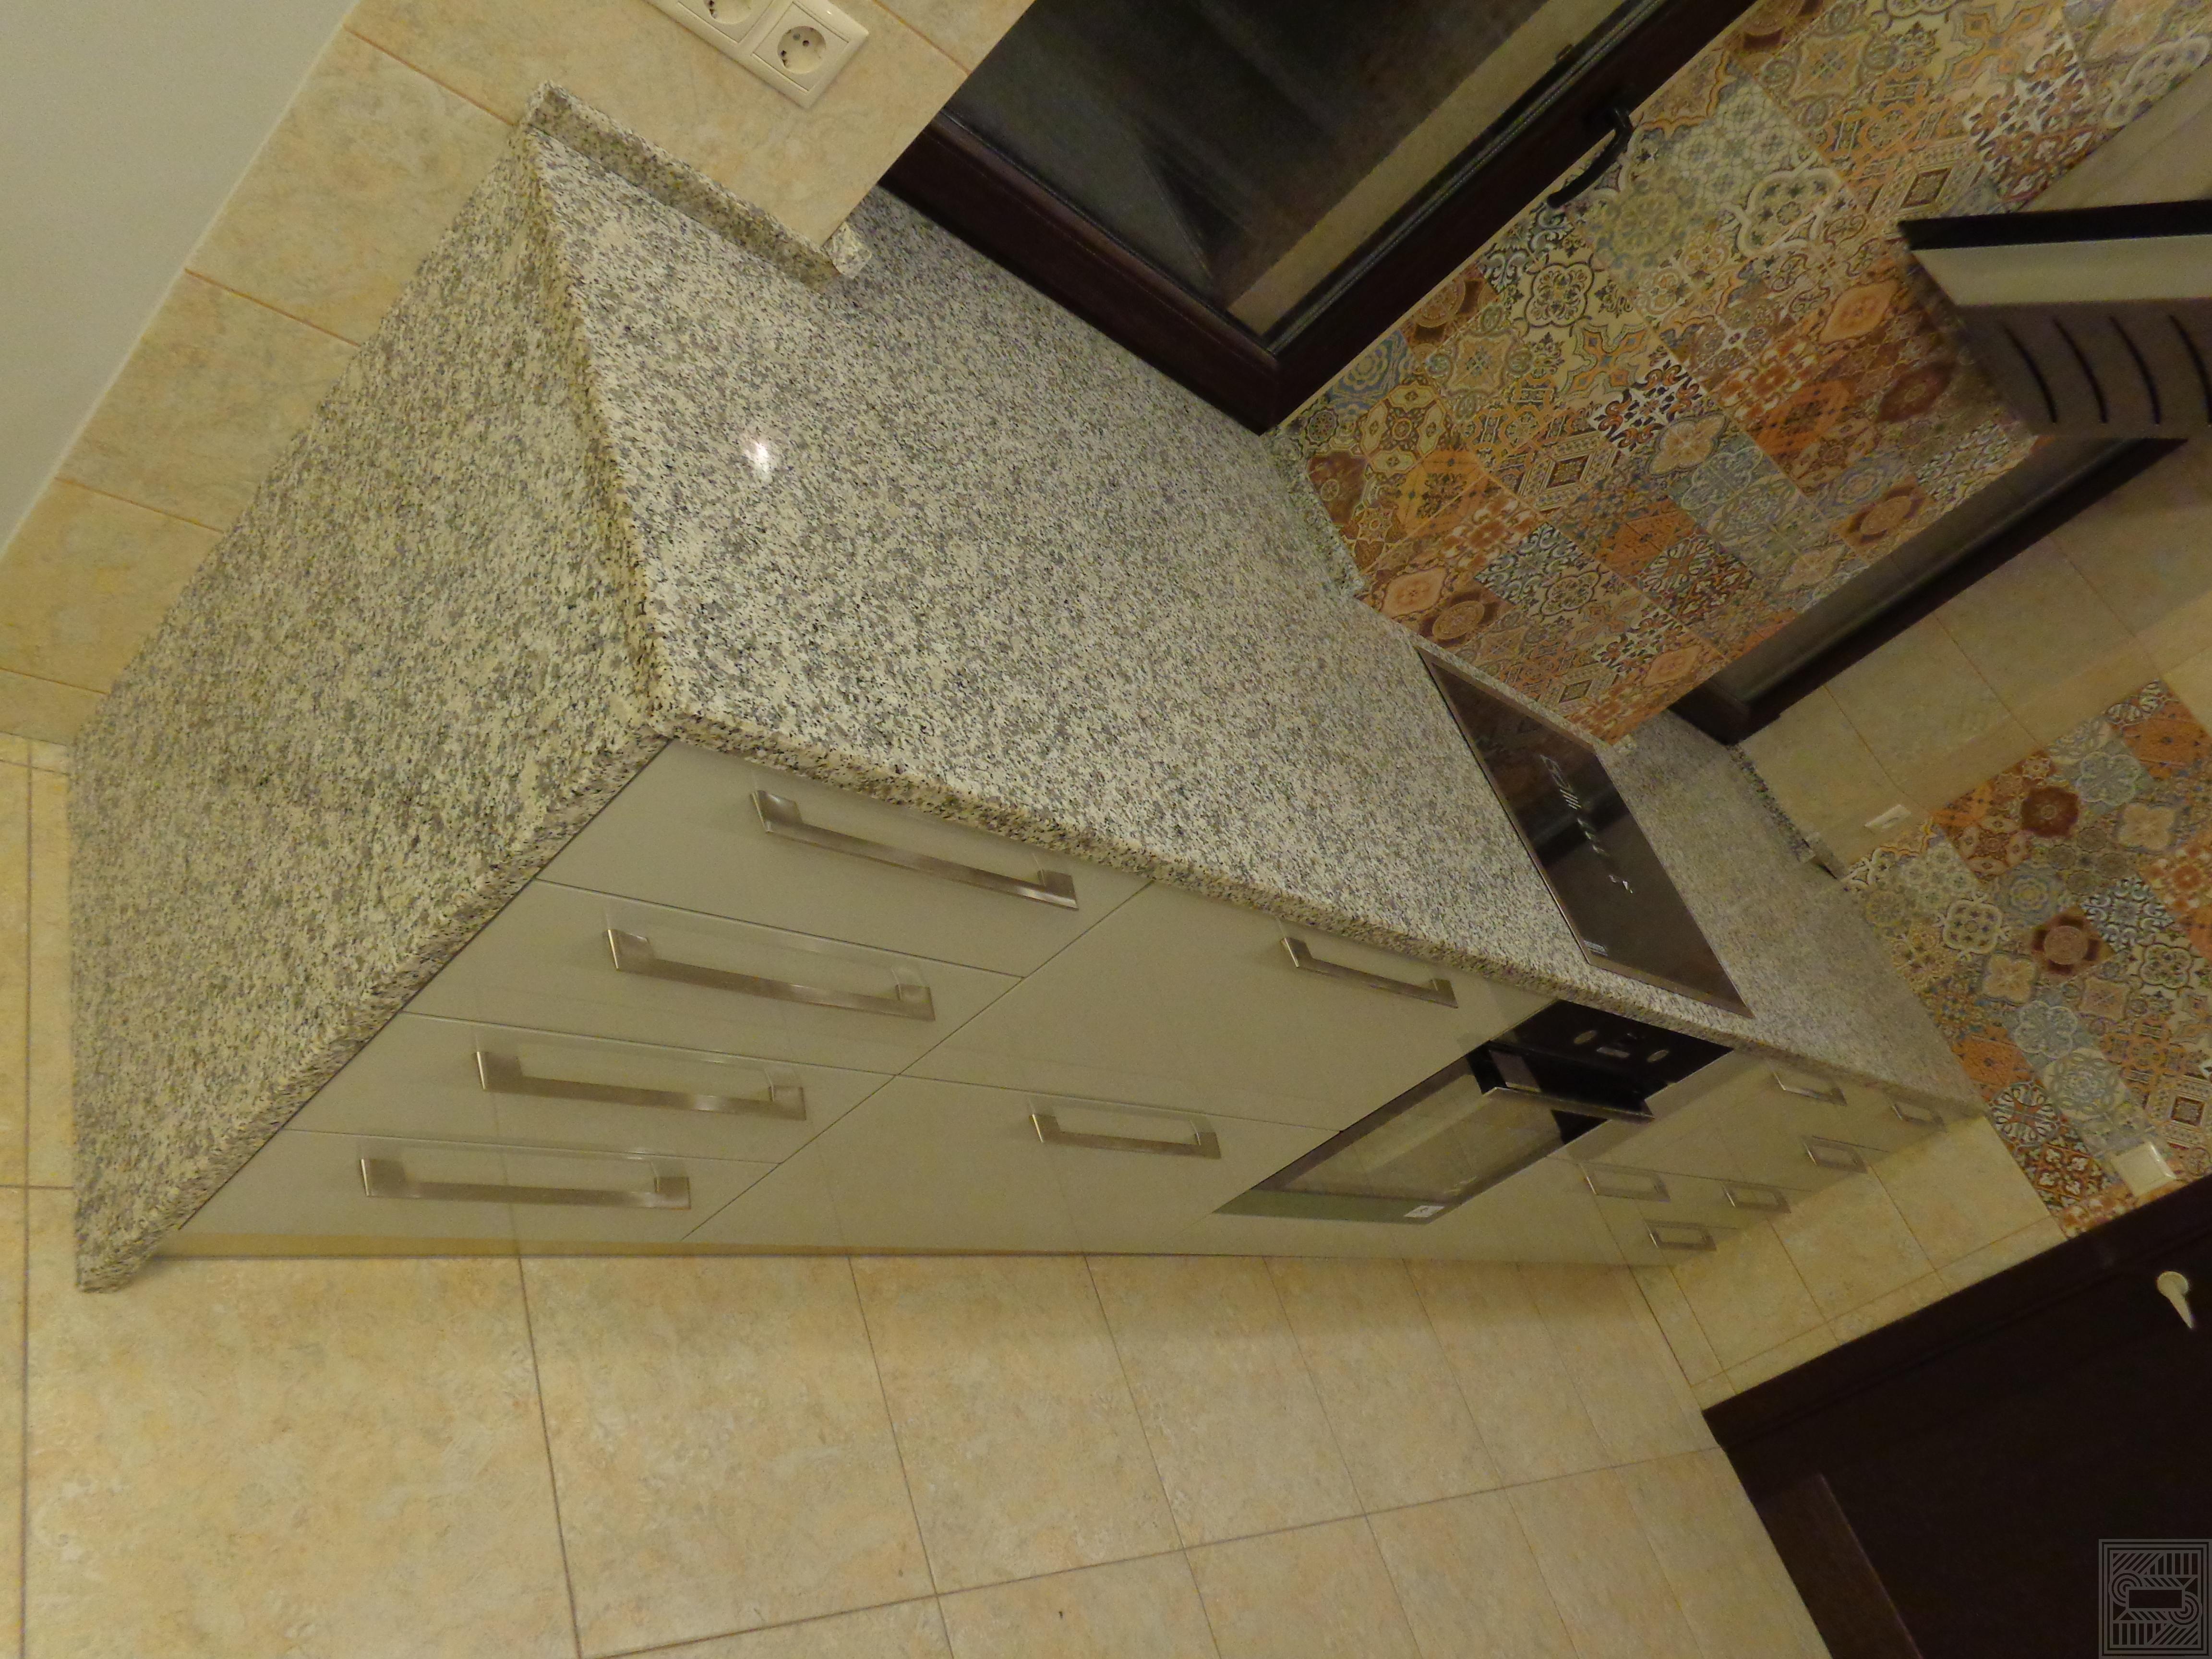 Столешница из гранита Bianco Sardo 30 мм worktop-granite - Stoleshnitsa iz granita Bianco Sardo 30 mm